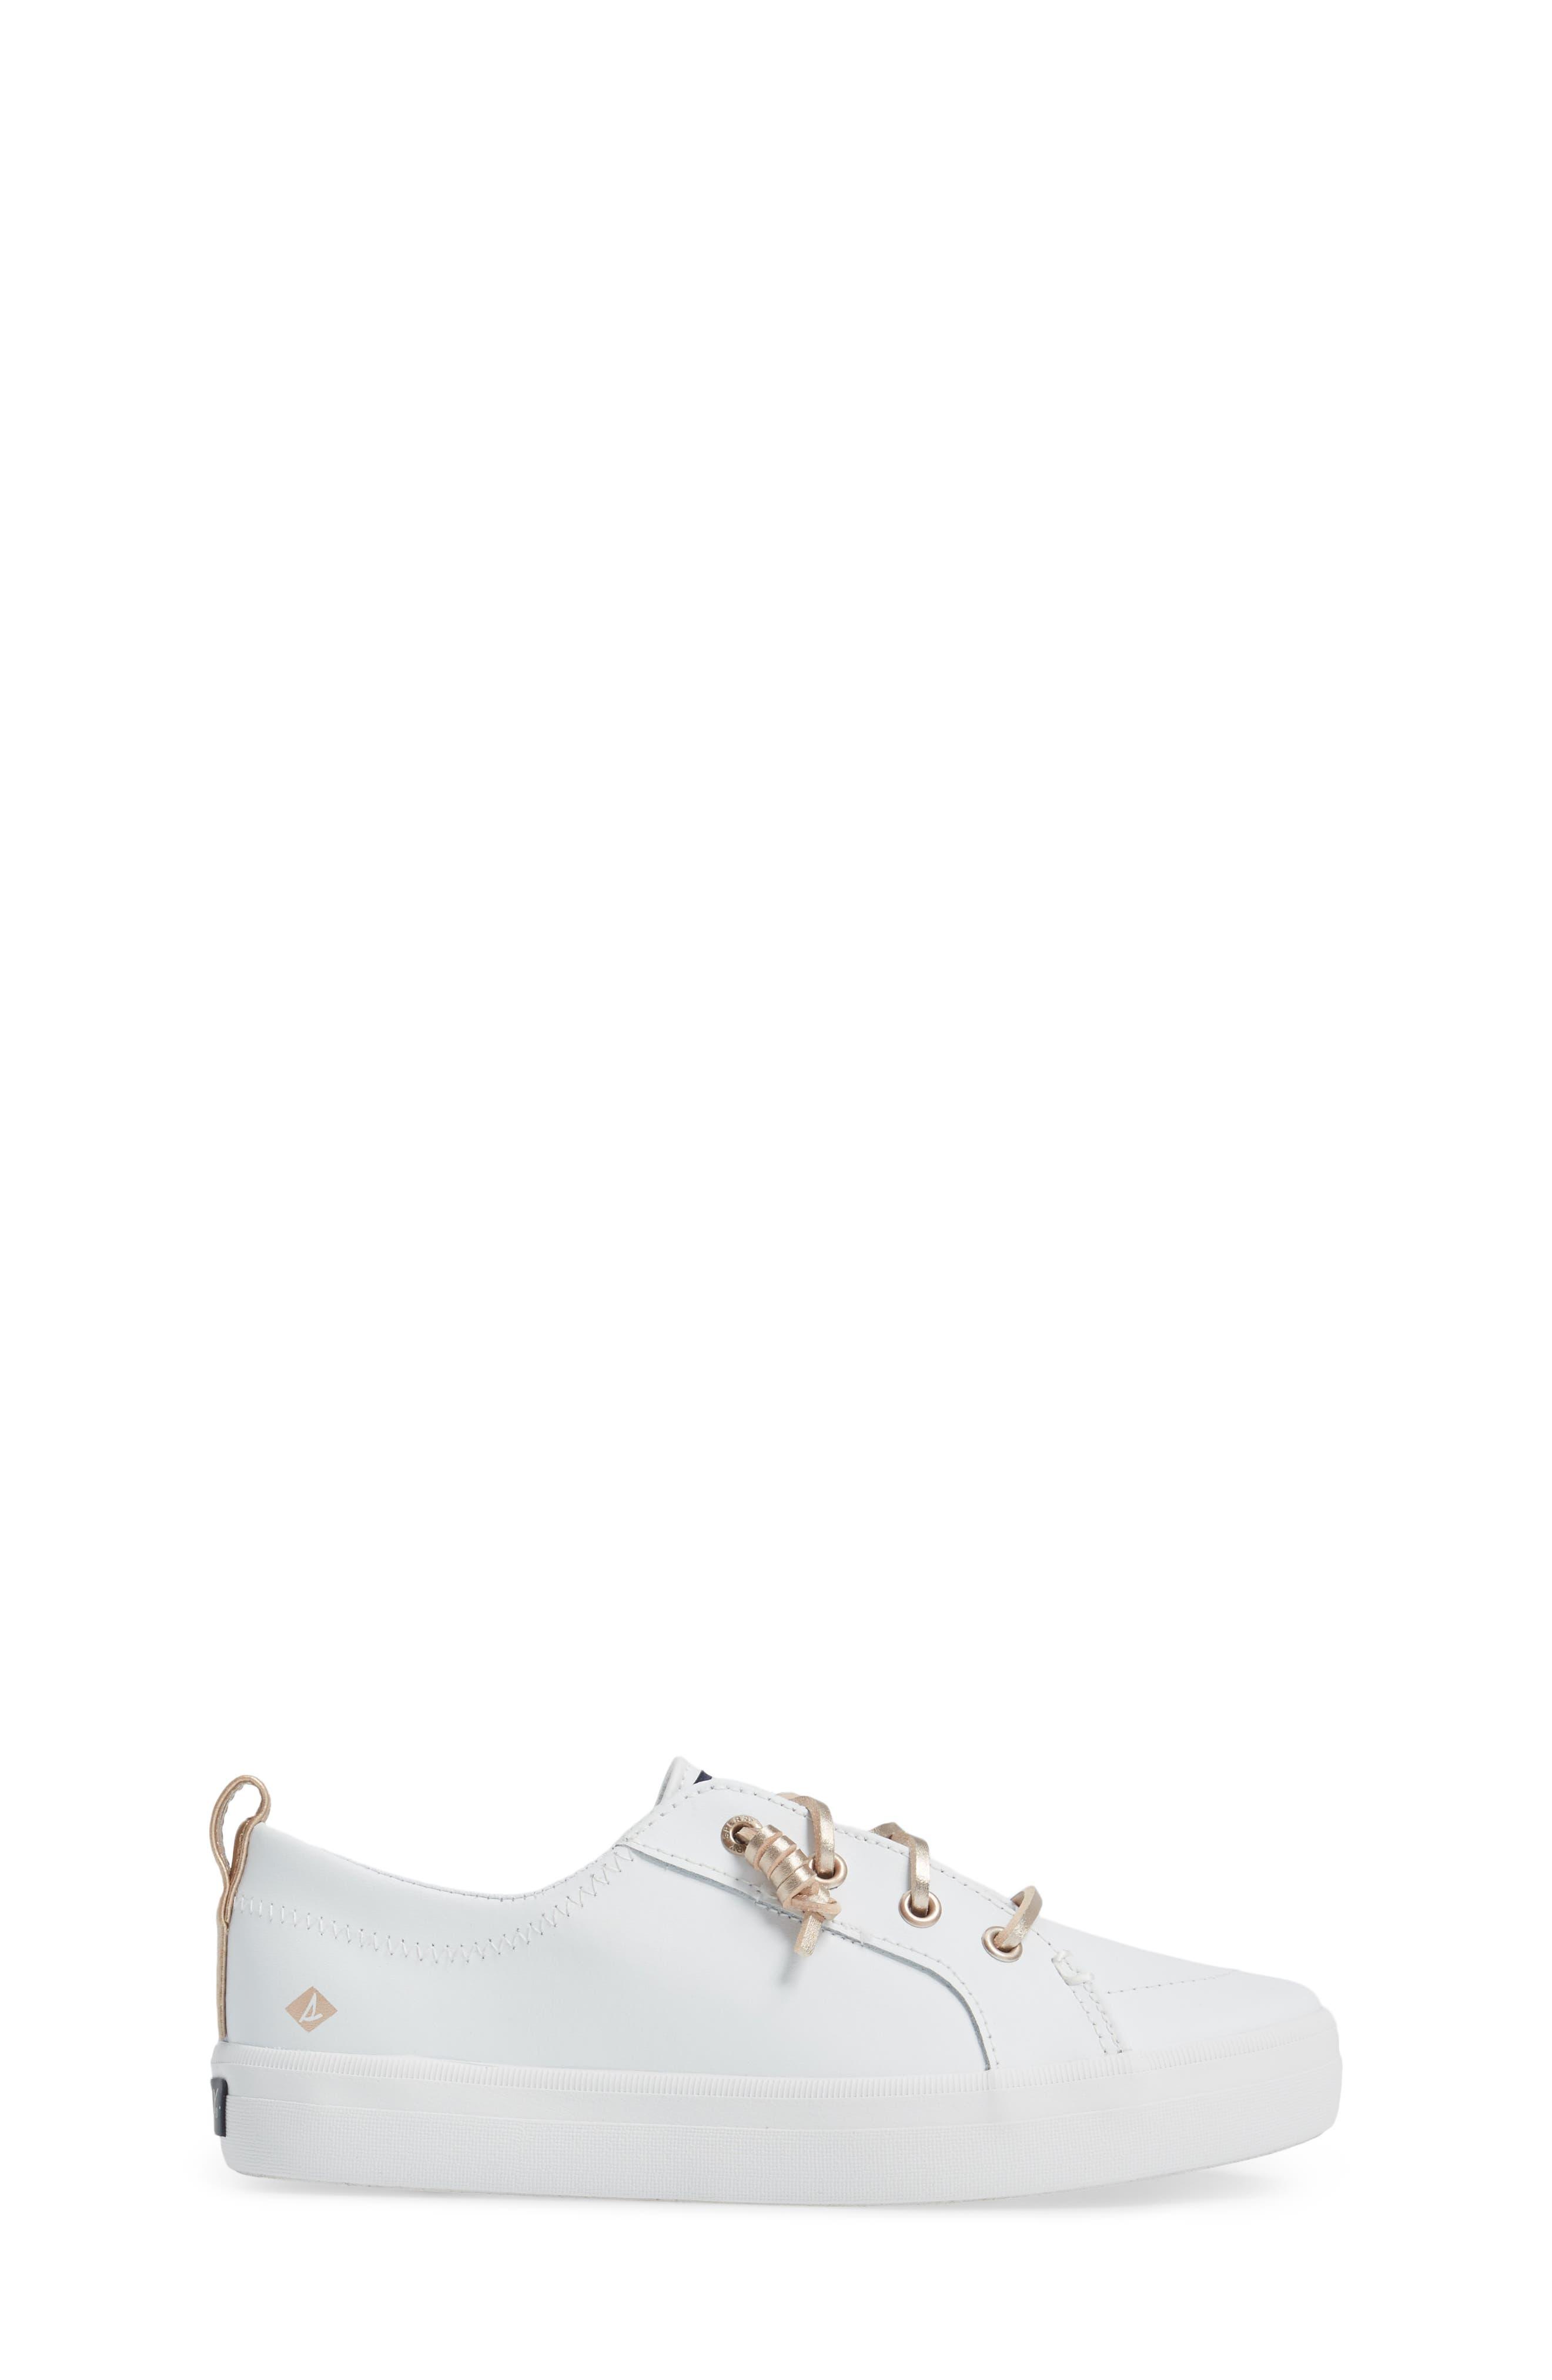 Sperry Crest Vibe Sneaker,                             Alternate thumbnail 3, color,                             WHITE LEATHER